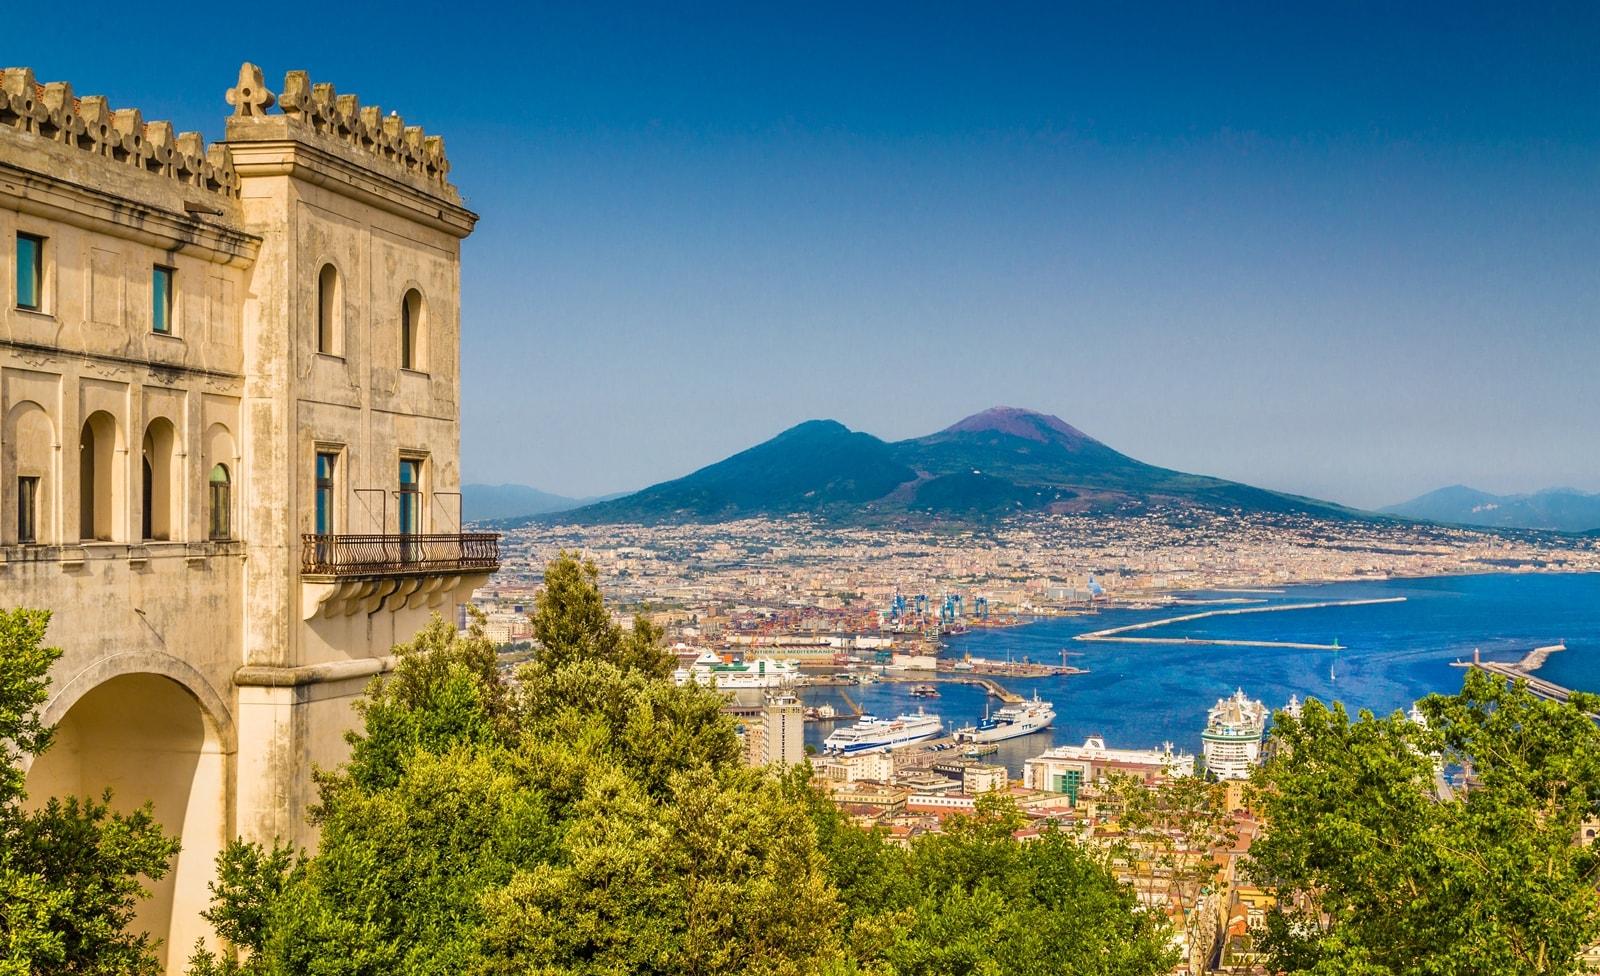 Der Vesuv in Italien